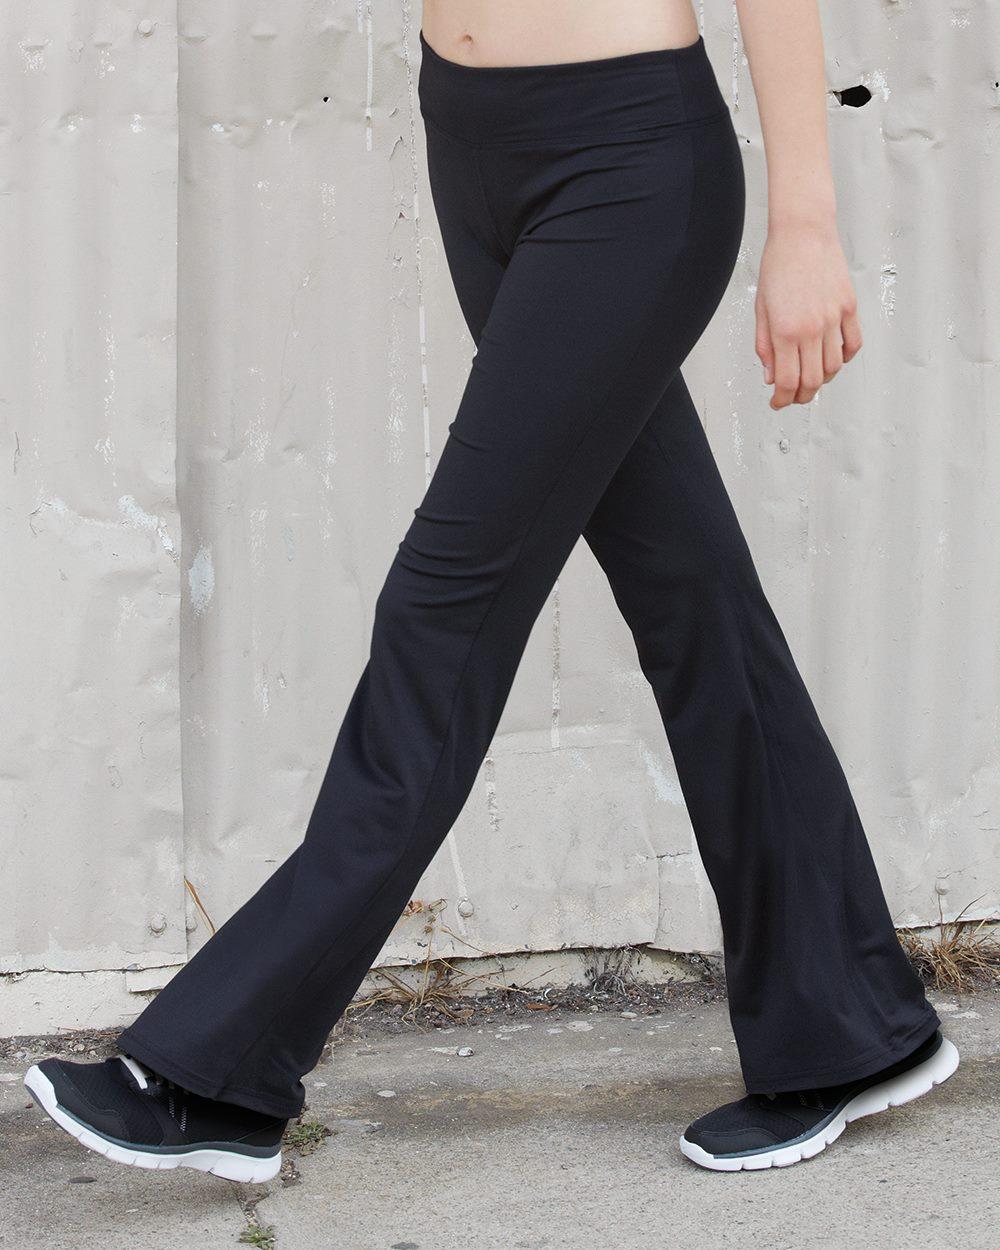 Badger 4218T - Women's Yoga Travel Pants Tall Sizes